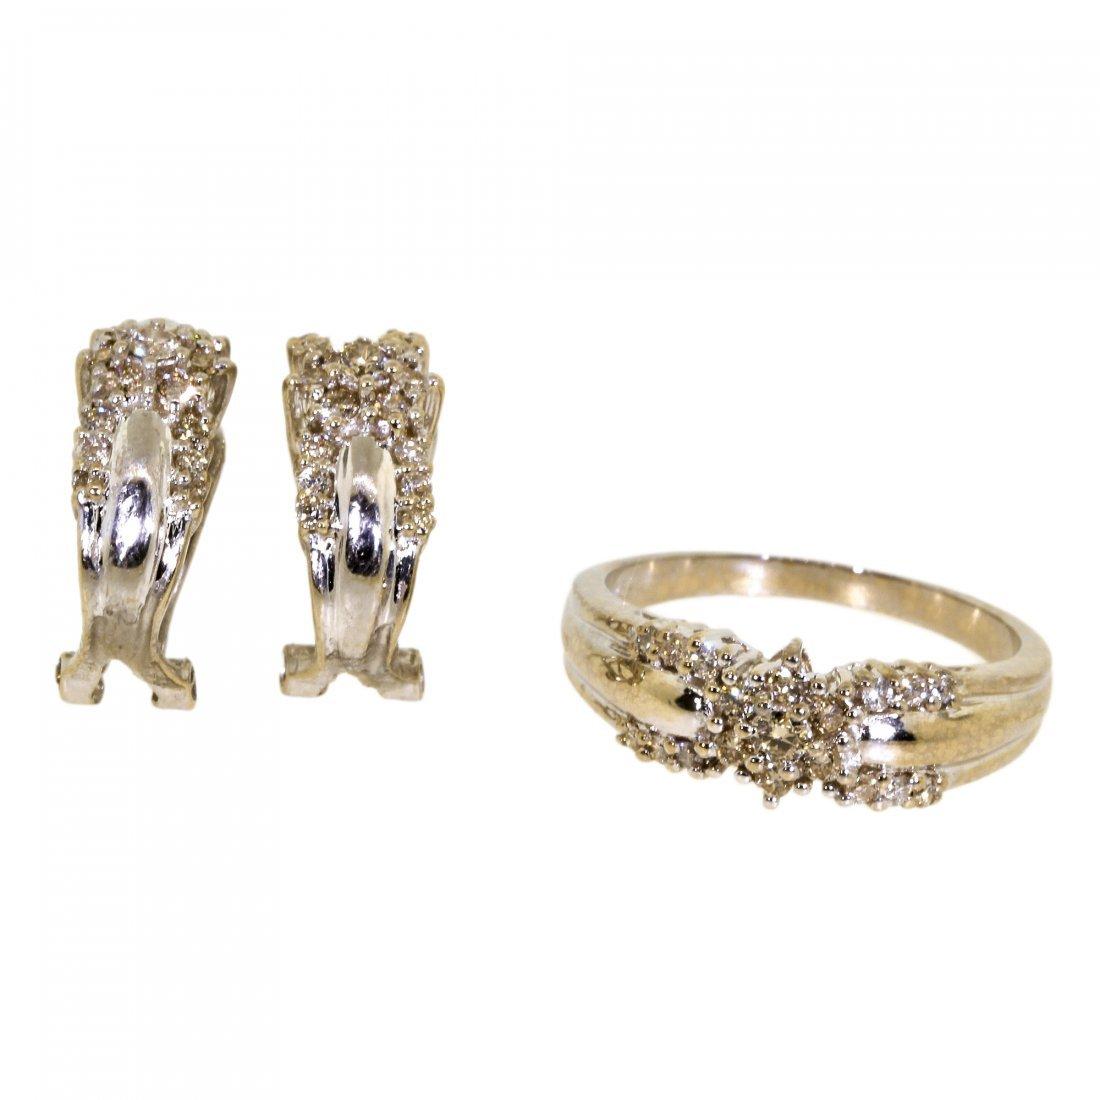 Charming Classic Estate 18K White Gold Diamond Ladies